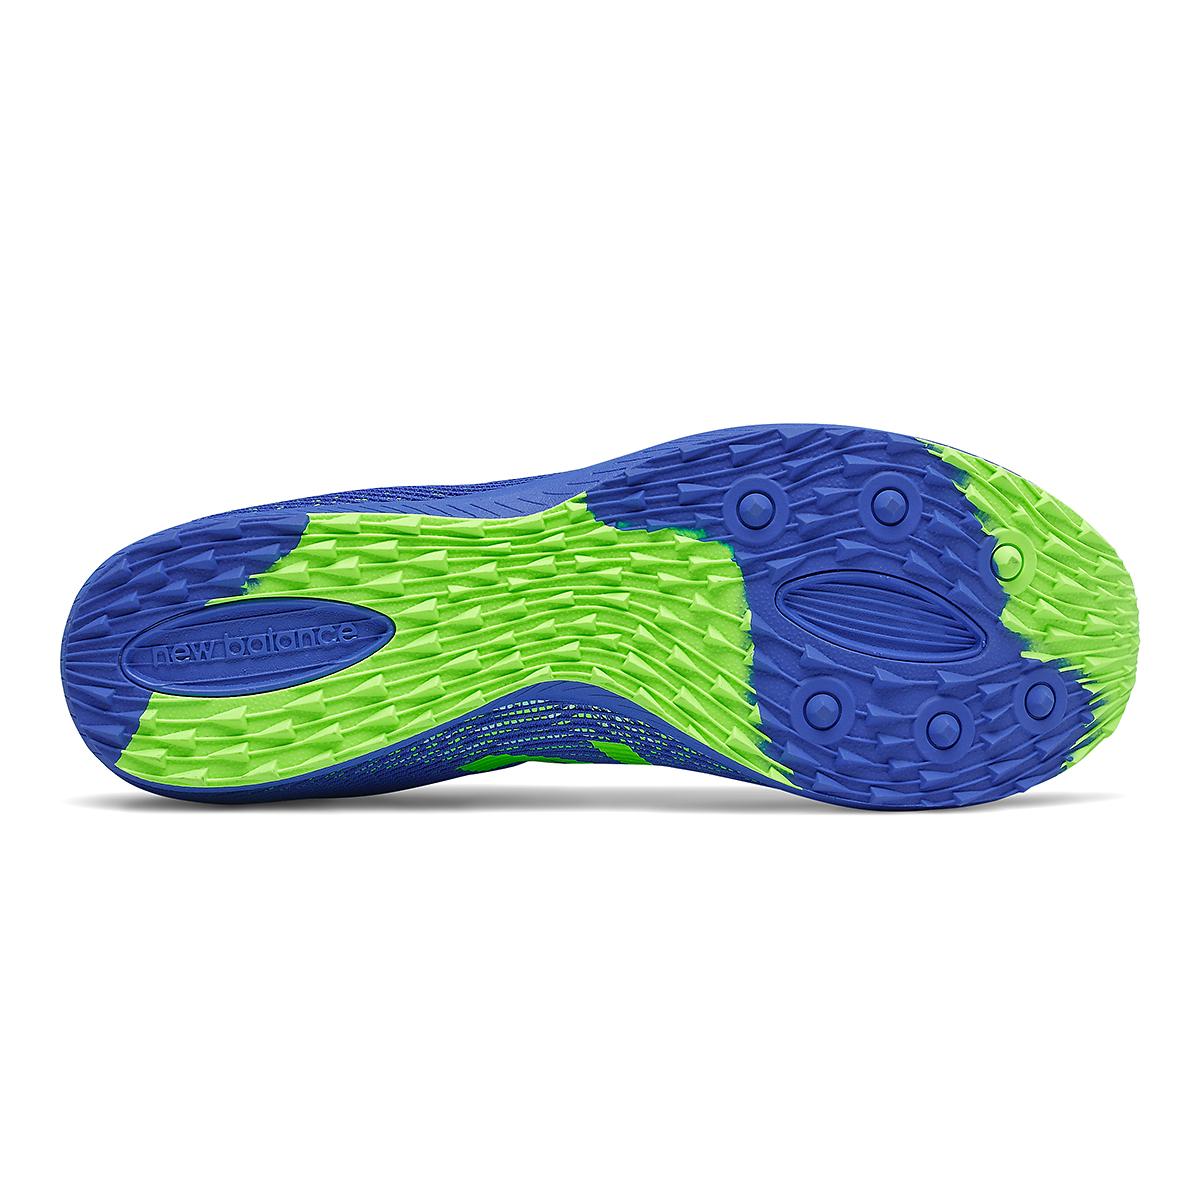 Men's New Balance XC Seven v3 Spikeless Shoe - Color: Cobalt/Energy Lime - Size: 7 - Width: Regular, Cobalt/Energy Lime, large, image 4